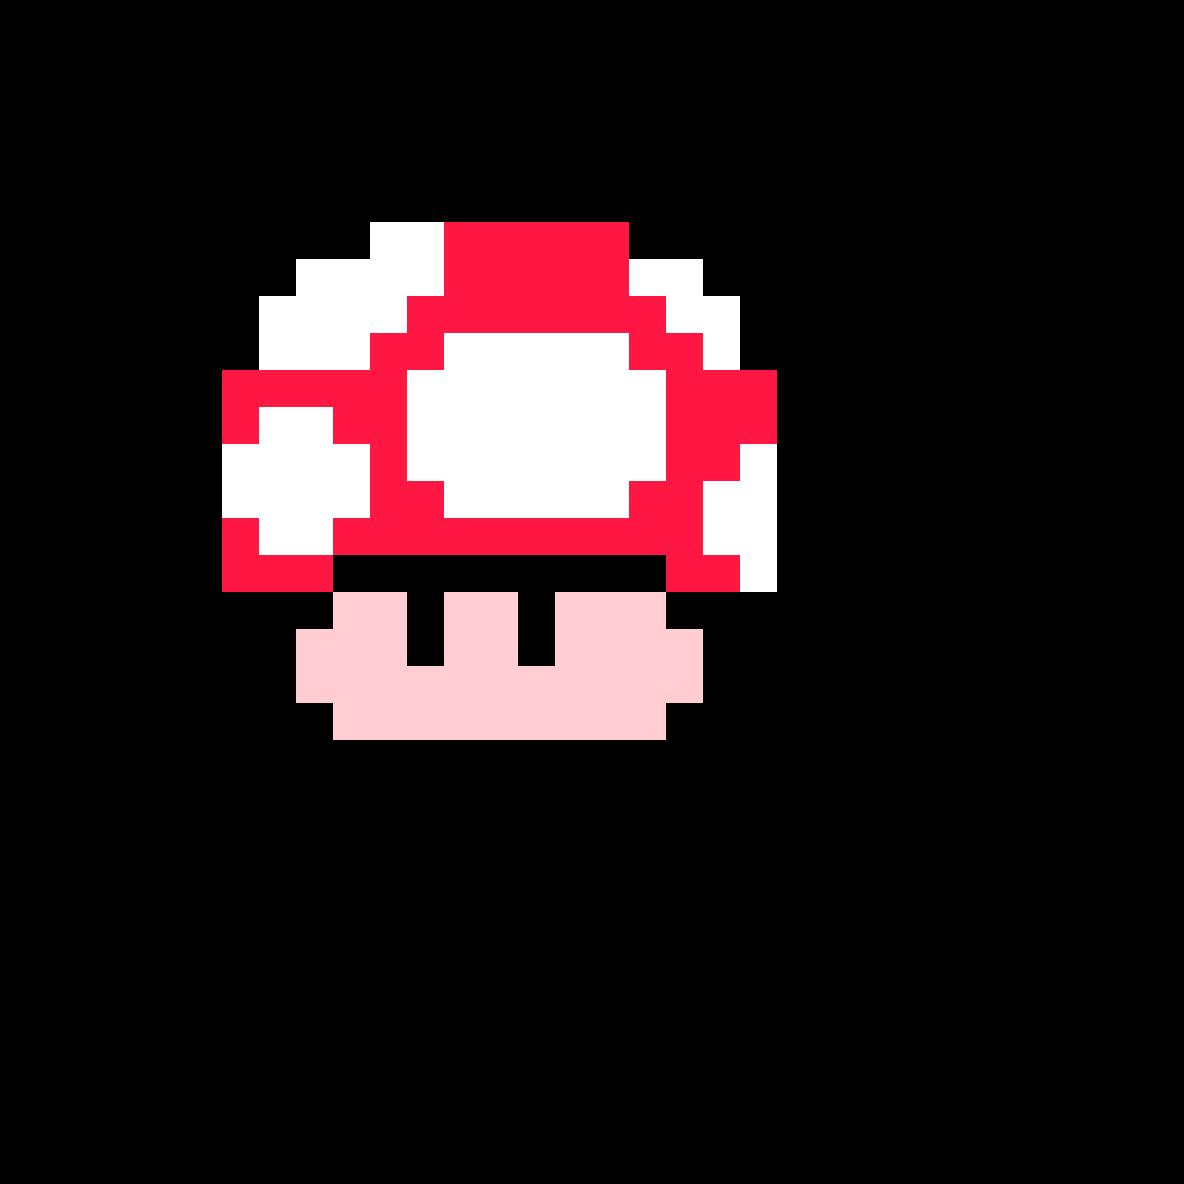 Pixilart Champignon Mario By Loooool